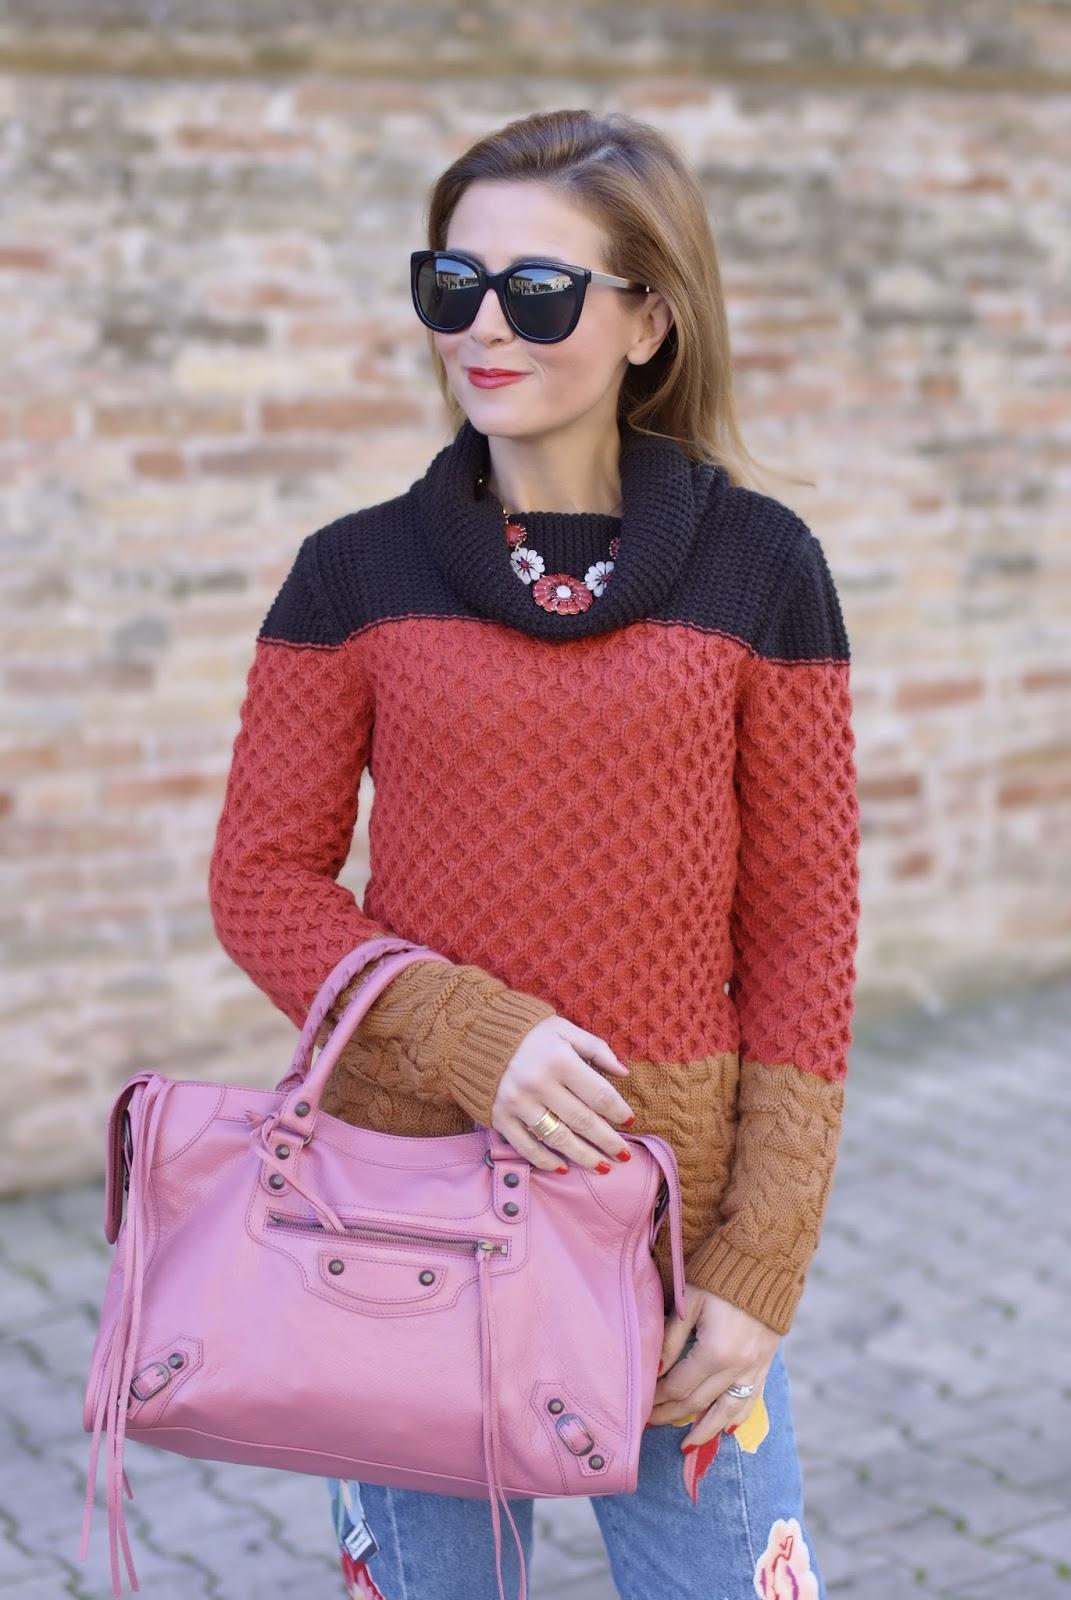 Winter Seventies Fashion with Smash! Gracian sweater and pink Balenciaga bag on Fashion and Cookies fashion blog, fashion blogger style